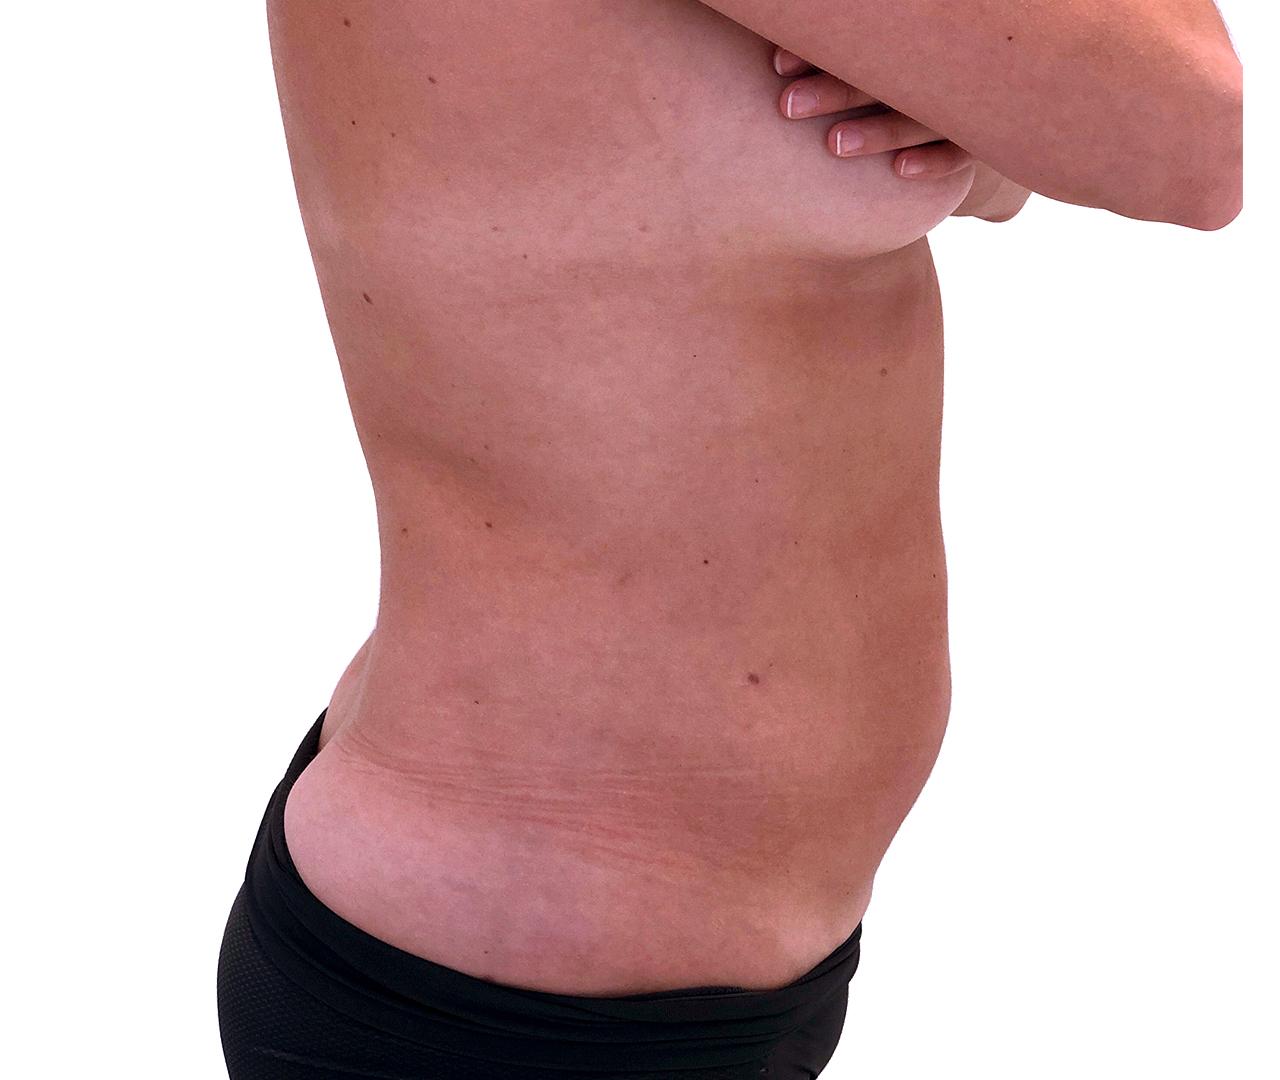 Liposuction Body 8